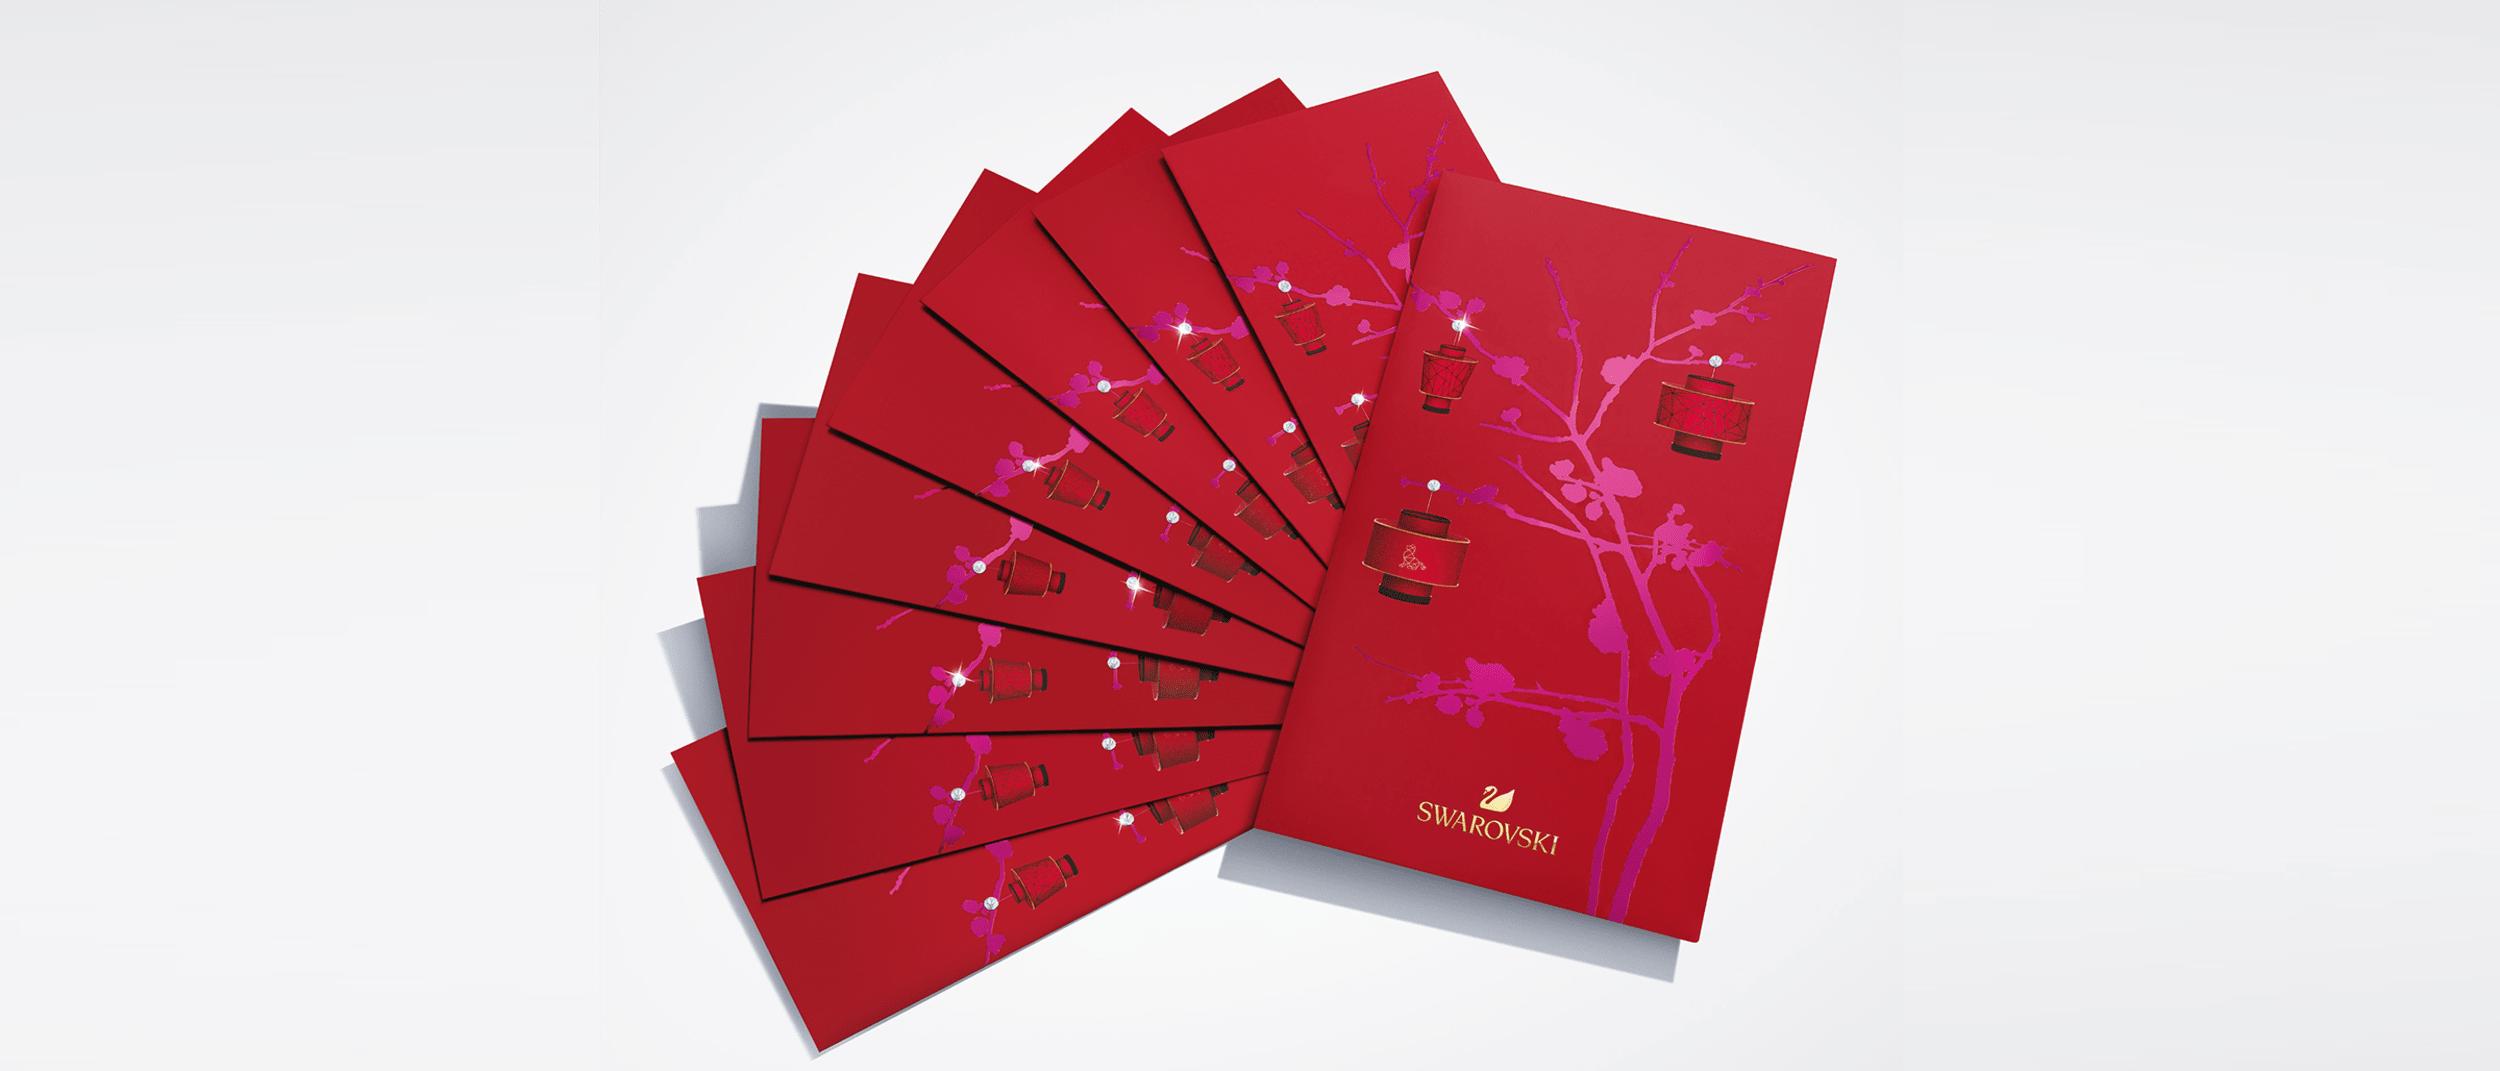 Swarovski: Lunar New Year crystallised red packets promotion